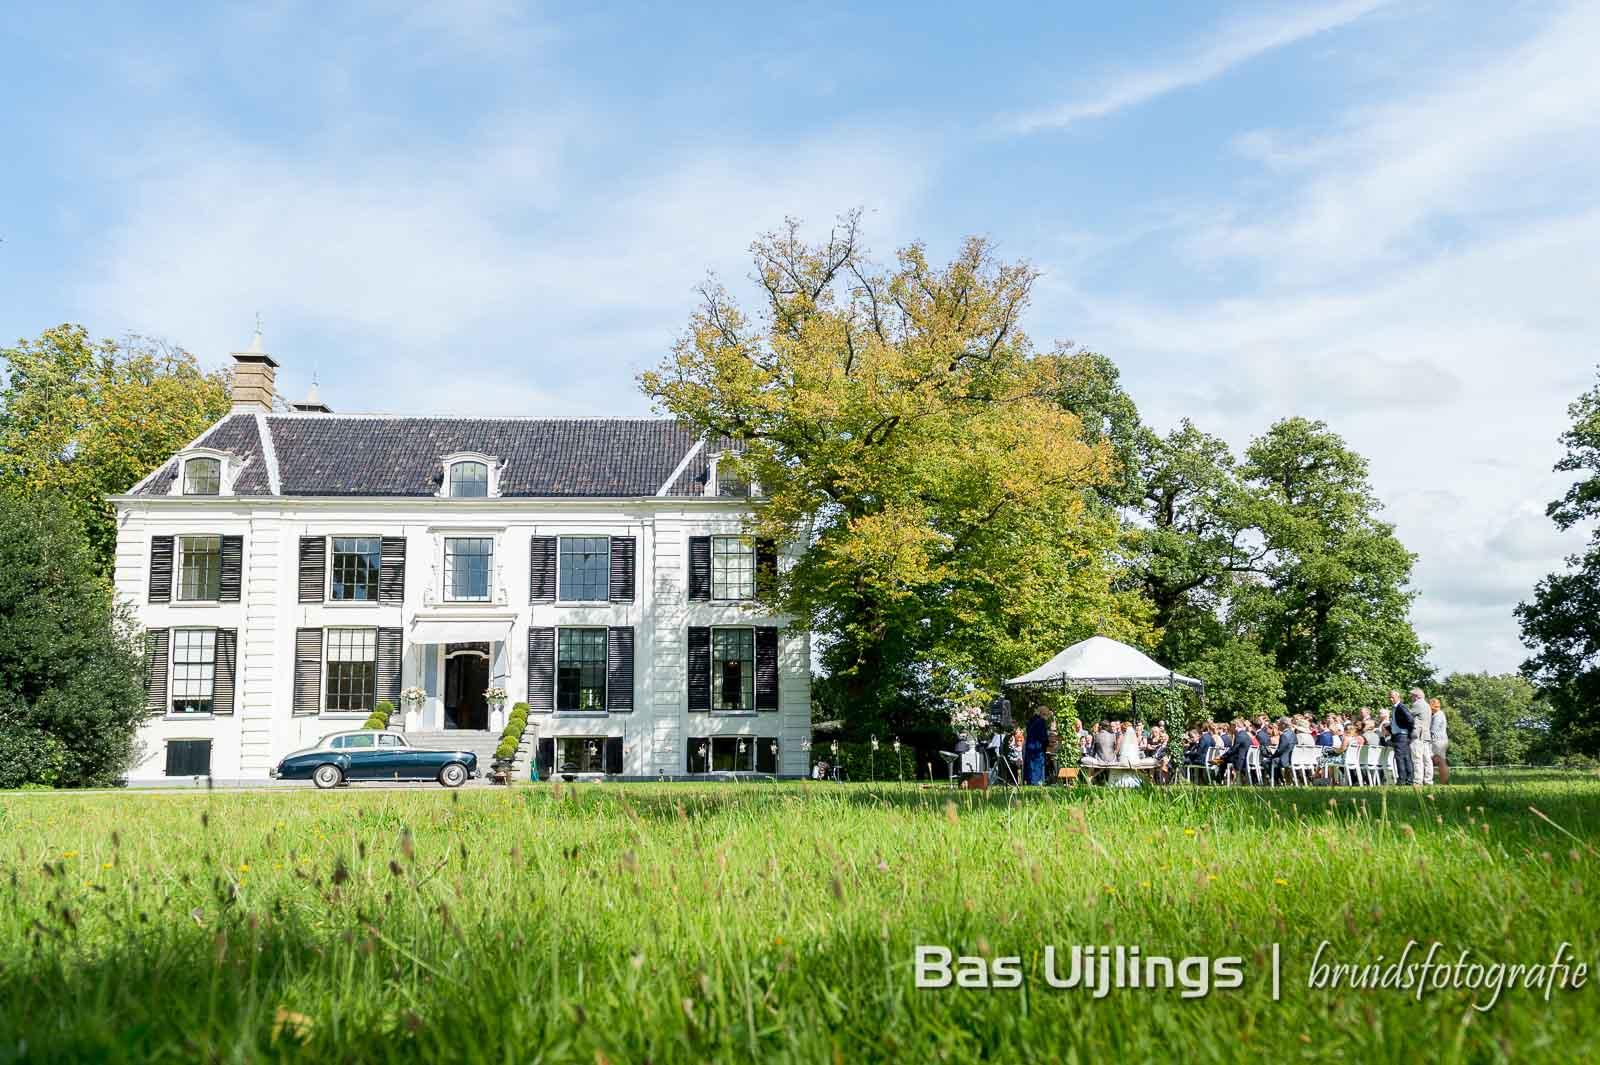 Bruidsfotografie Landgoed Waterland Velsen-ZuidBas Uijlings ...